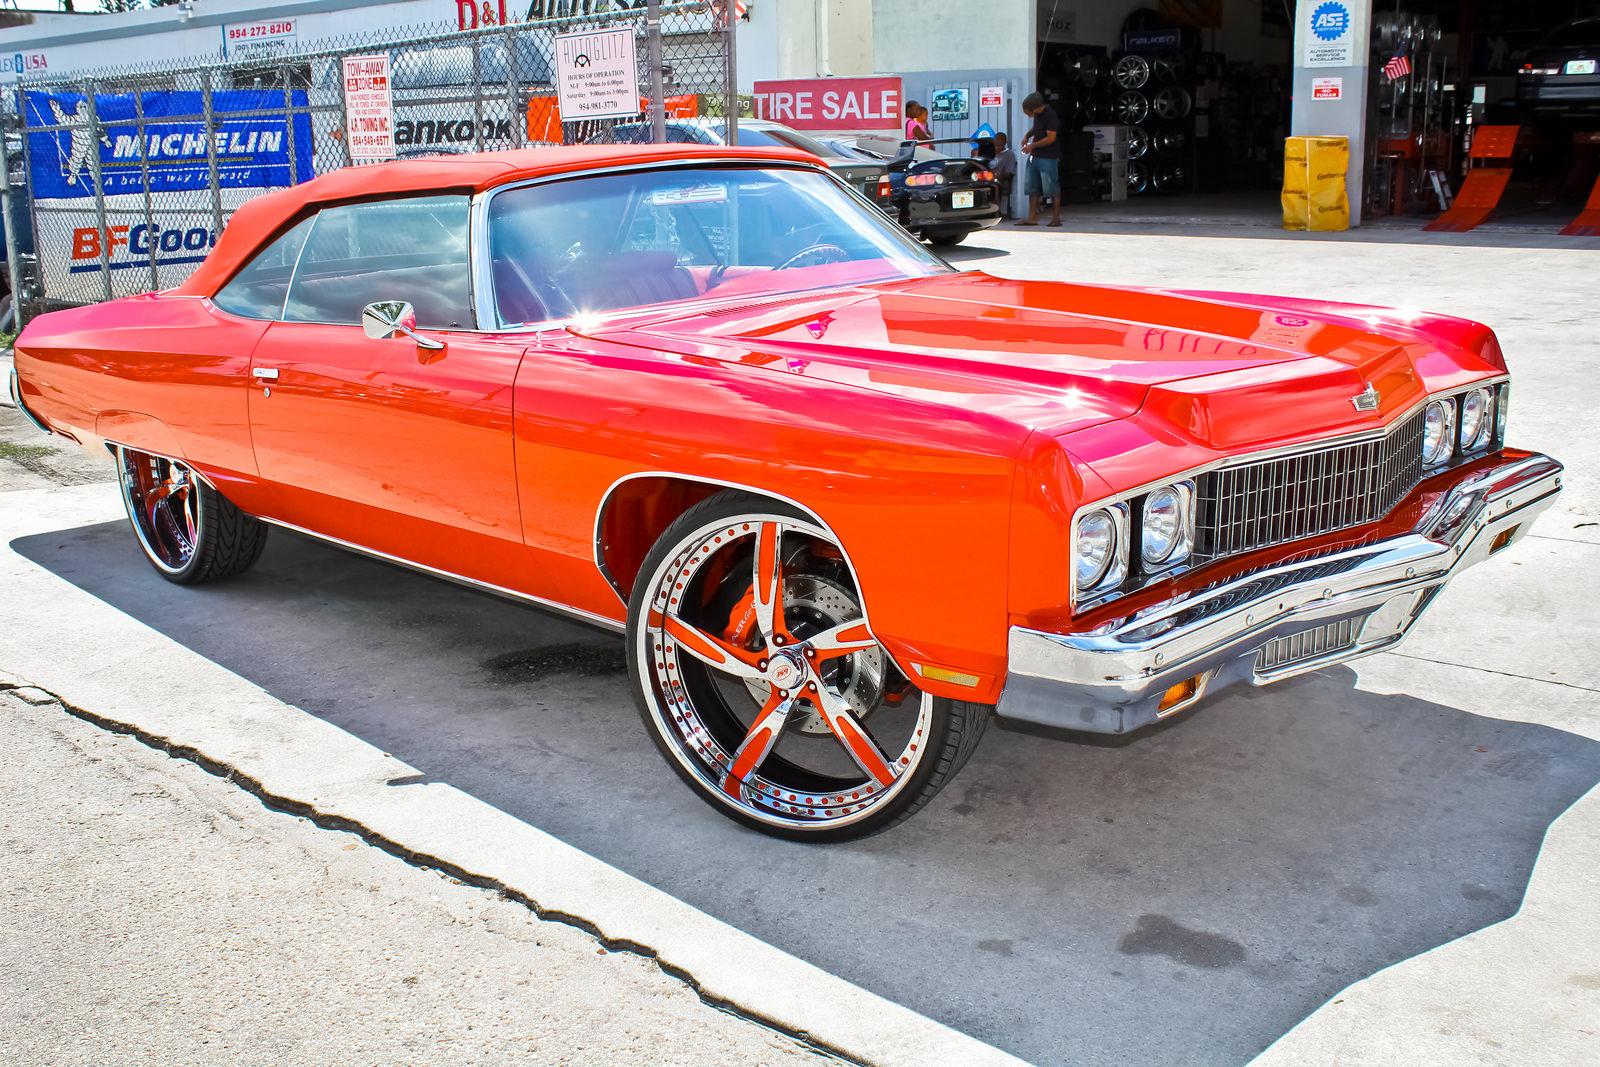 Rapper Rick Ross's 1973 Impala Donk - Big Rims - Custom Wheels